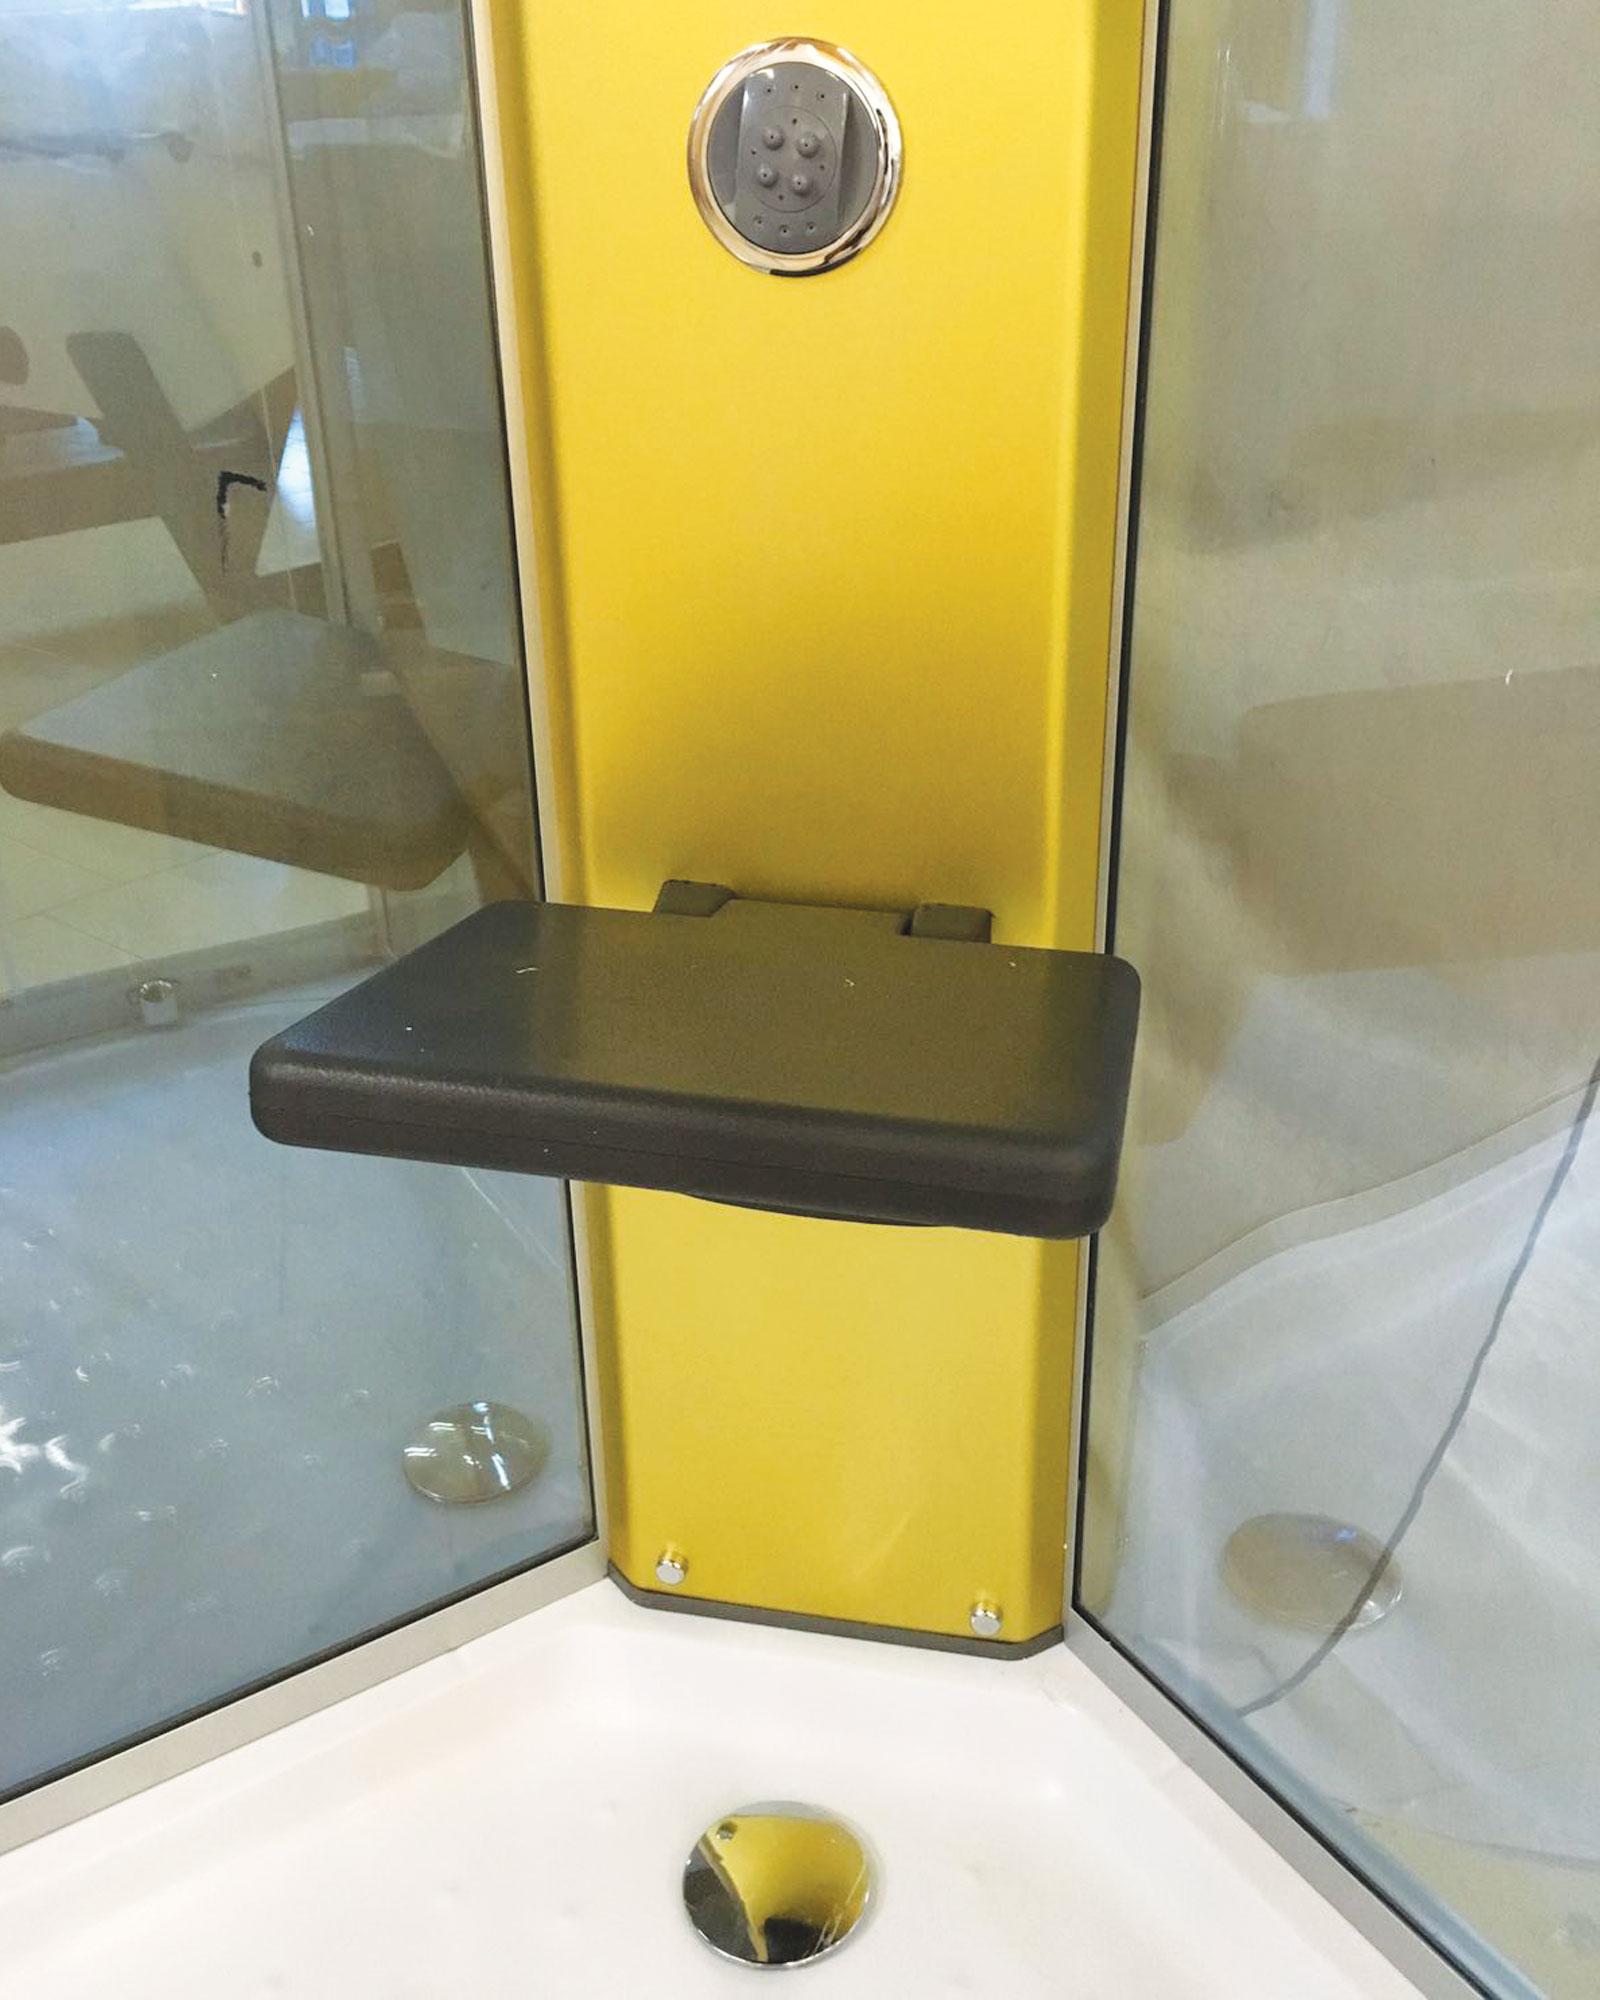 Box doccia idromassaggio 90 x 90 arredobagno cabina doccia full optional key we ebay - Doccia all italiana ...